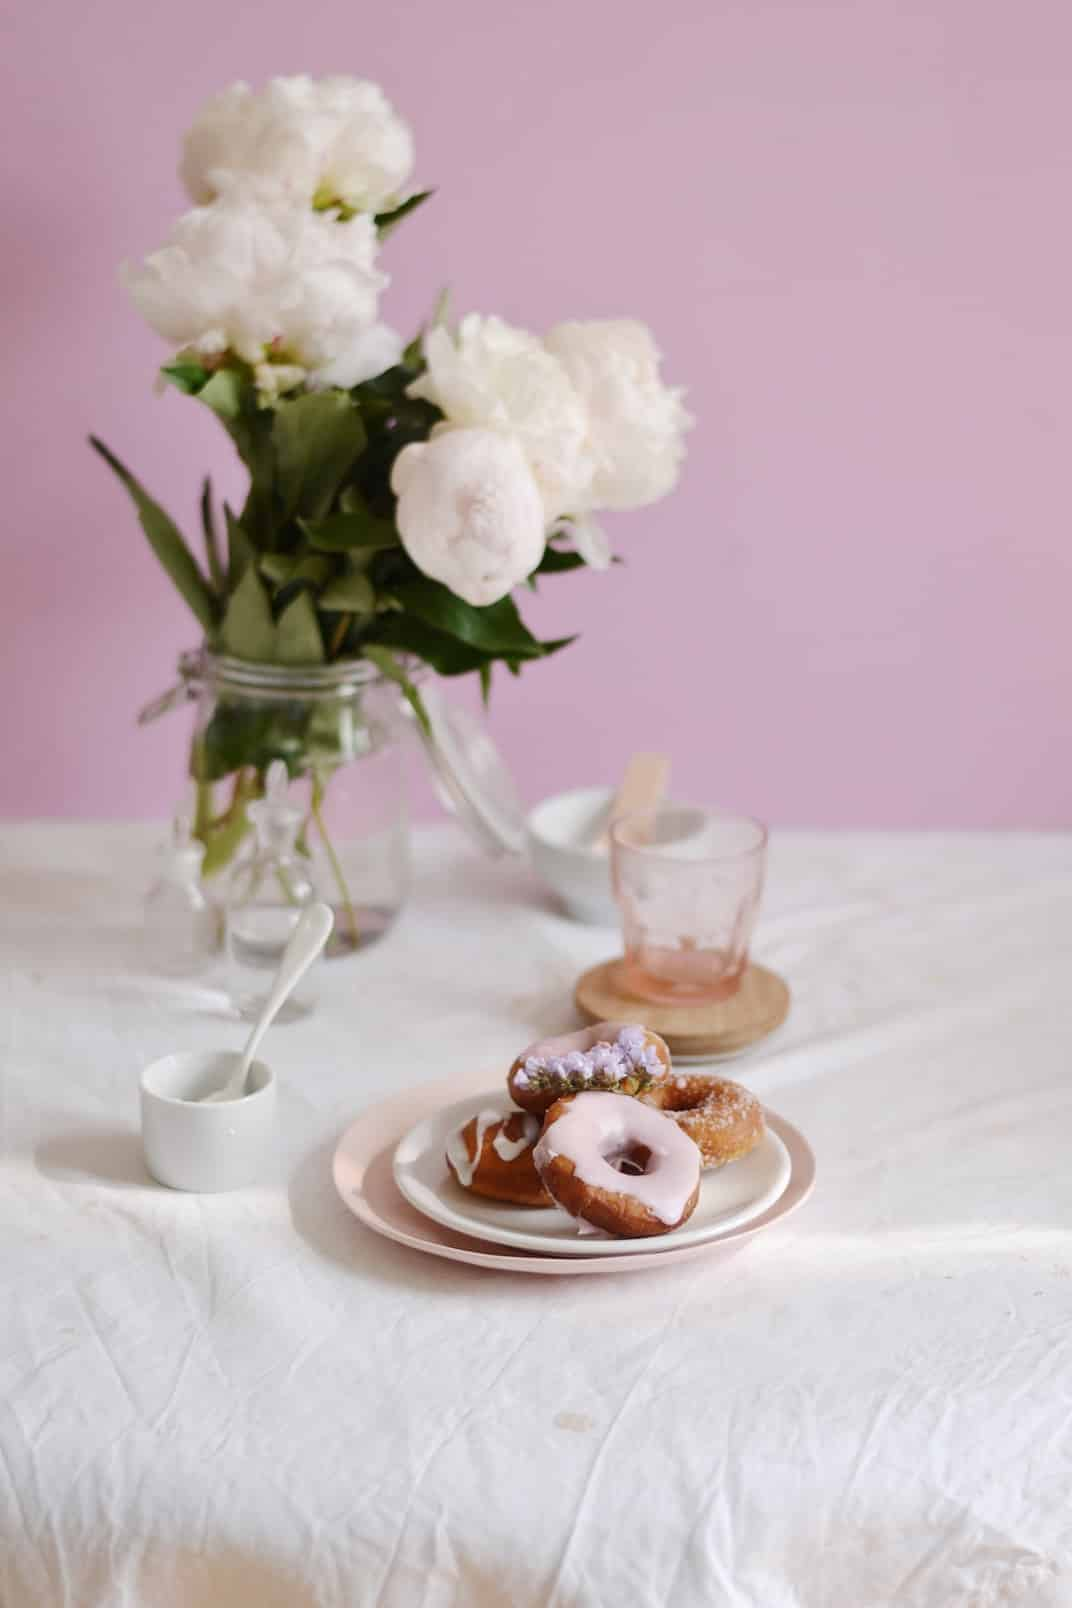 Doughnuts - recette de Linda Lomelino